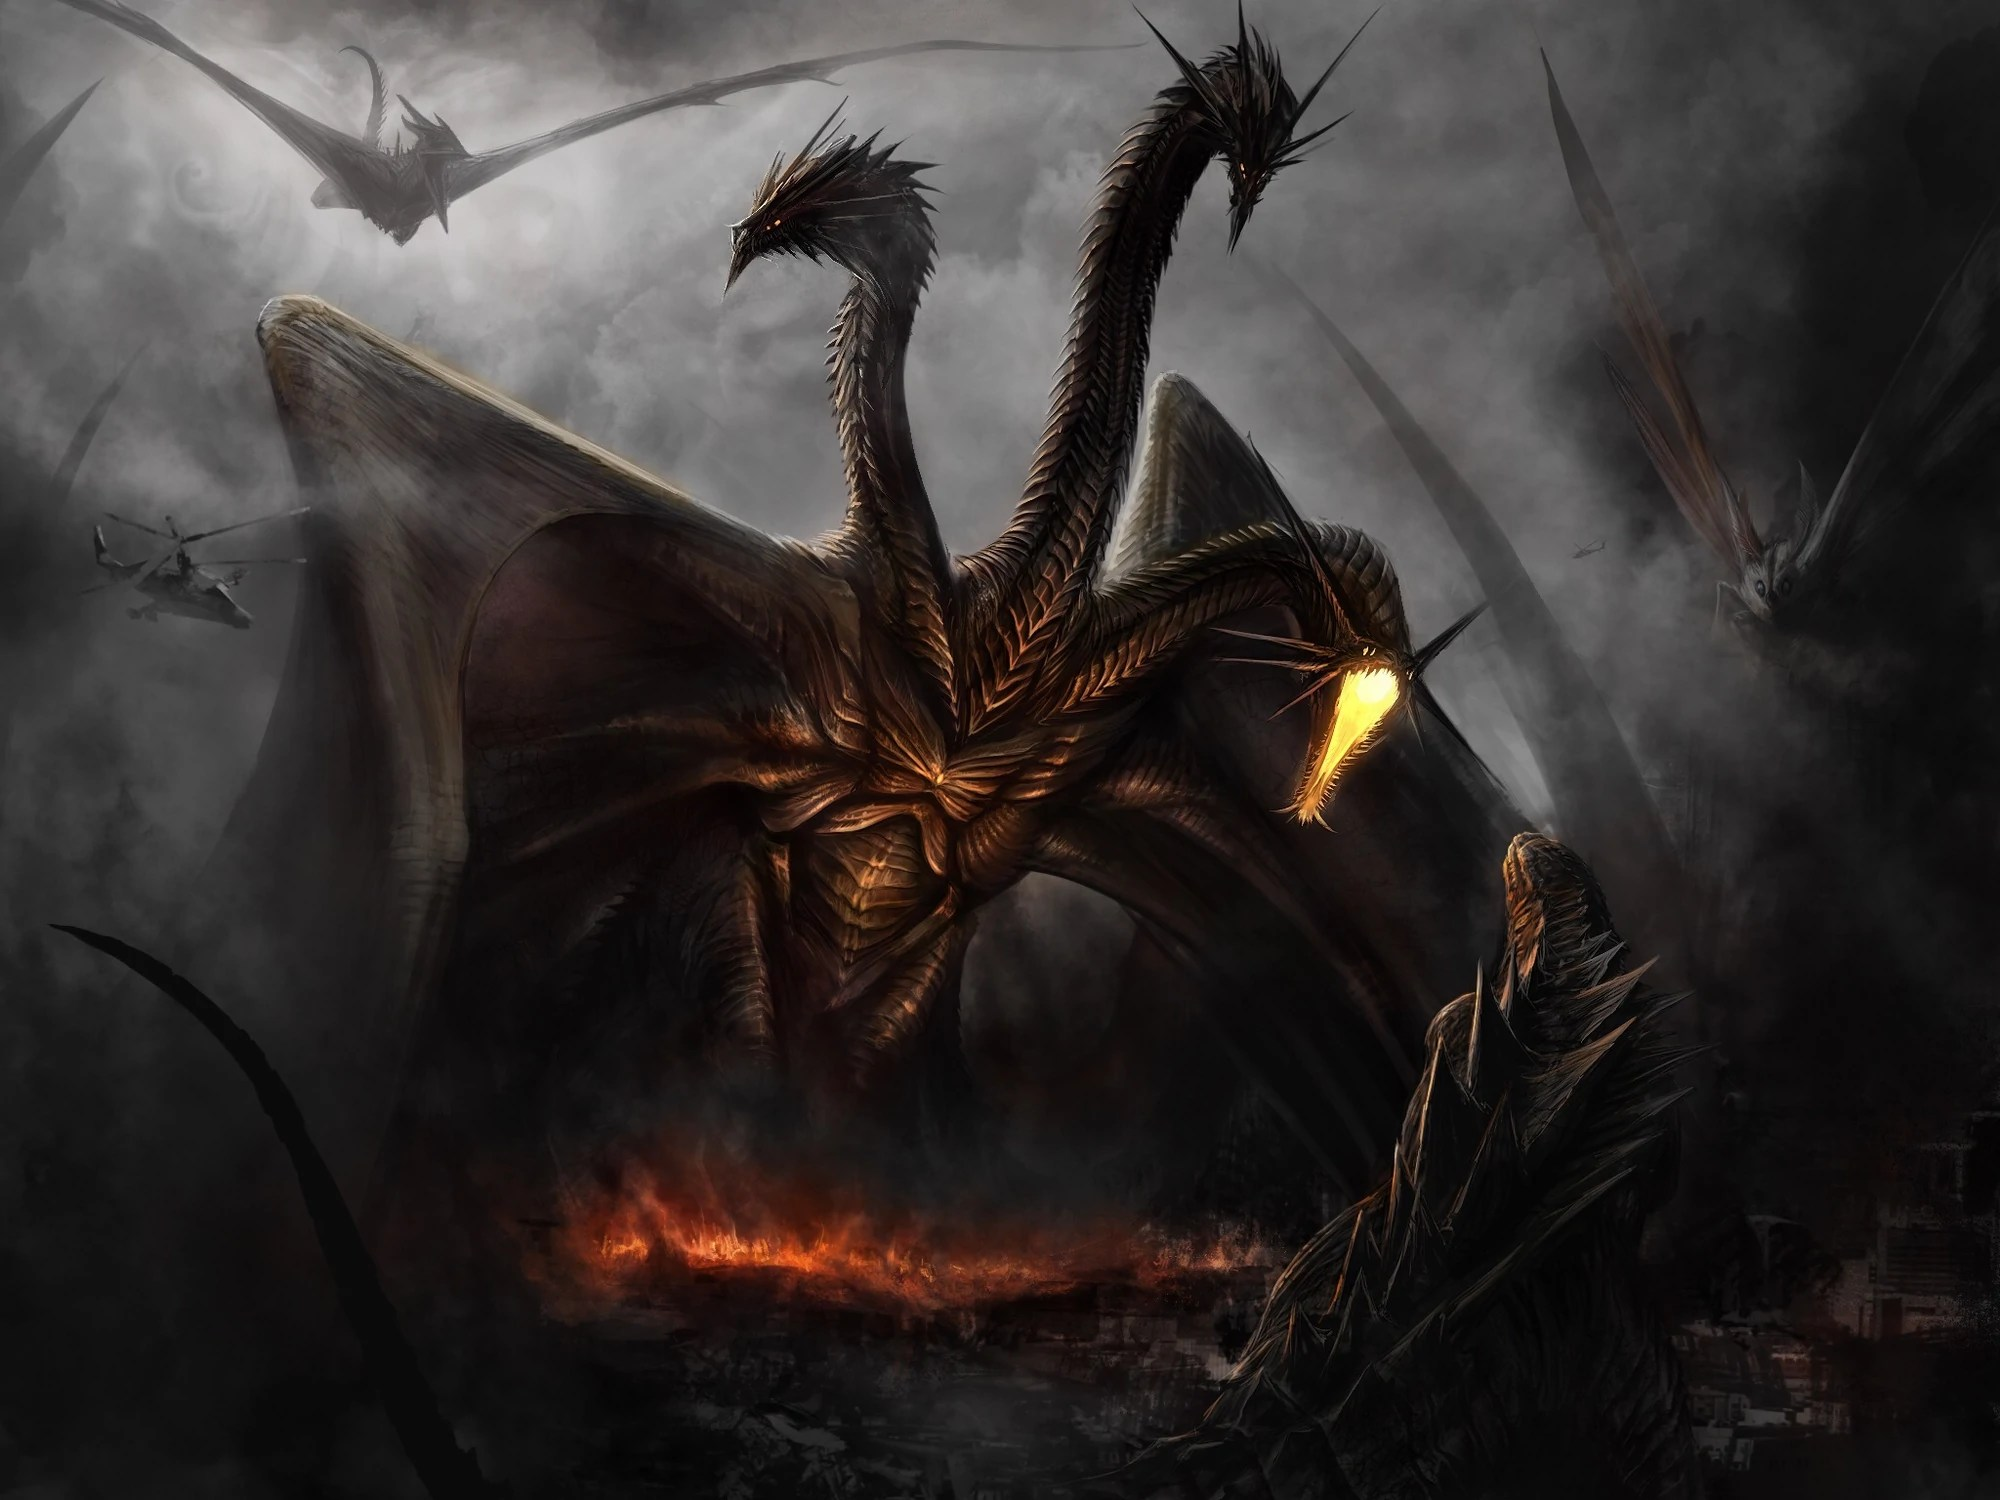 Animated Spider Wallpaper Godzilla King Of The Monsters Idea Wiki Fandom